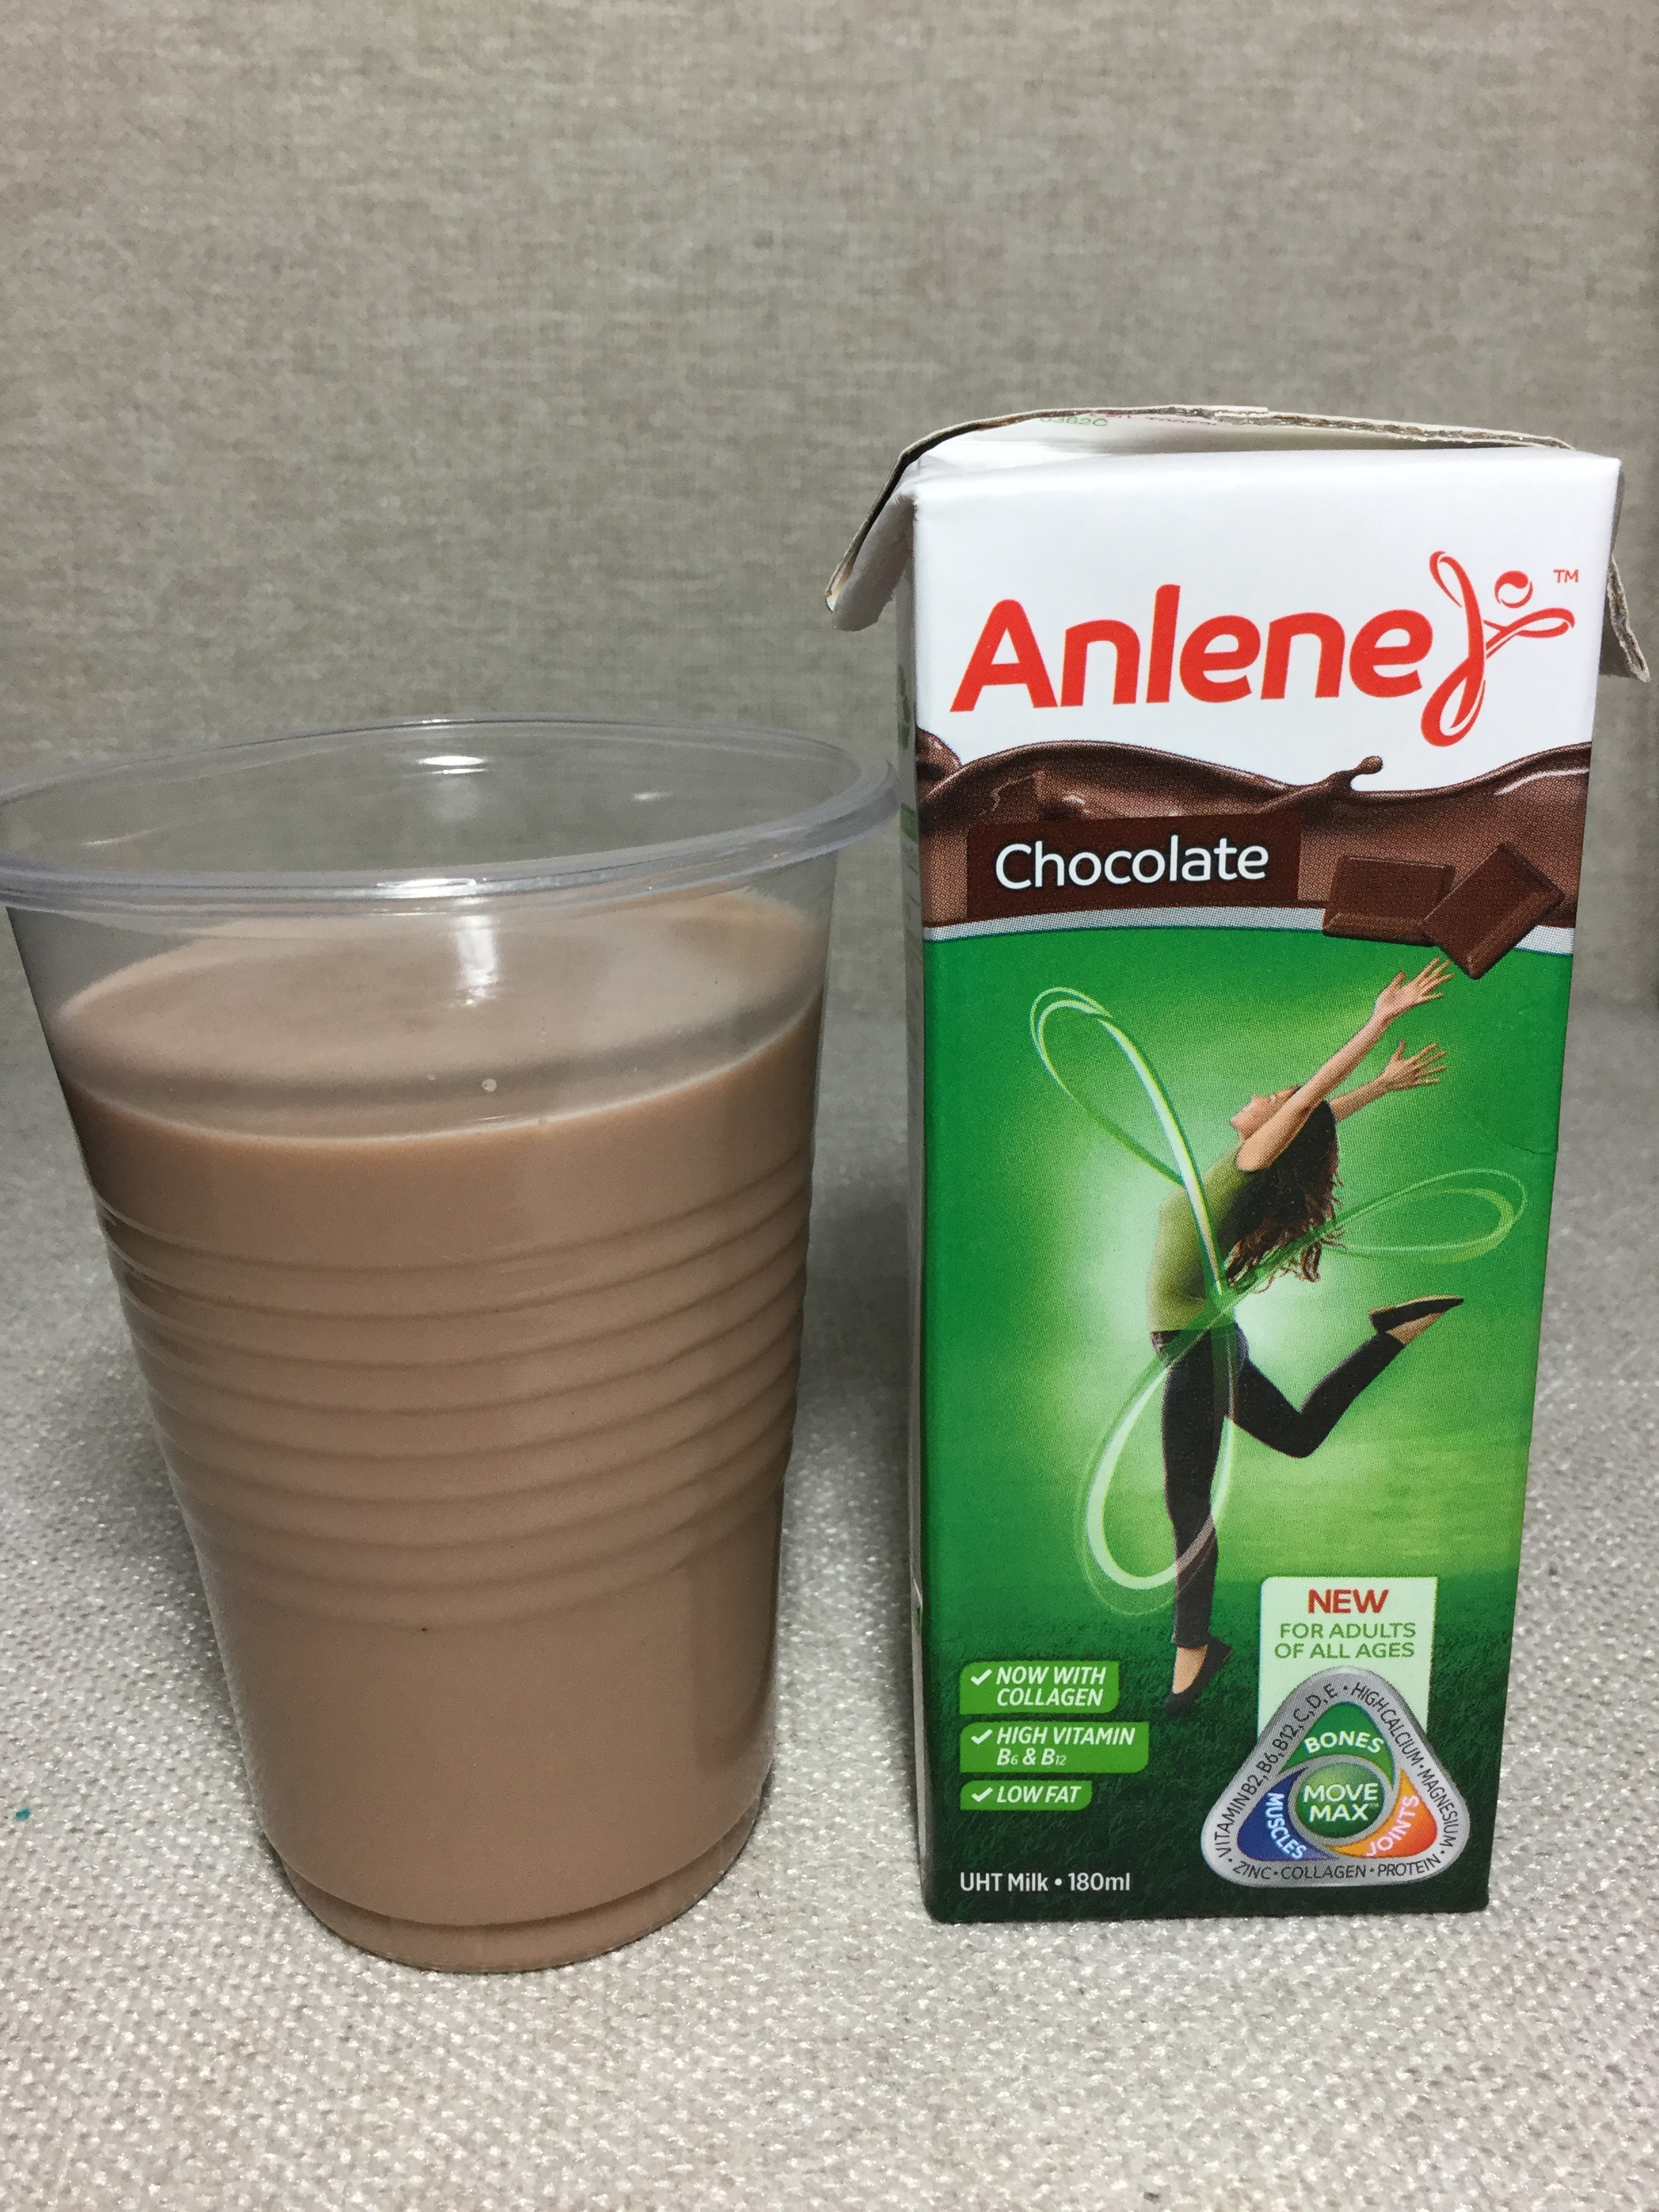 Anlene Chocolate Cup